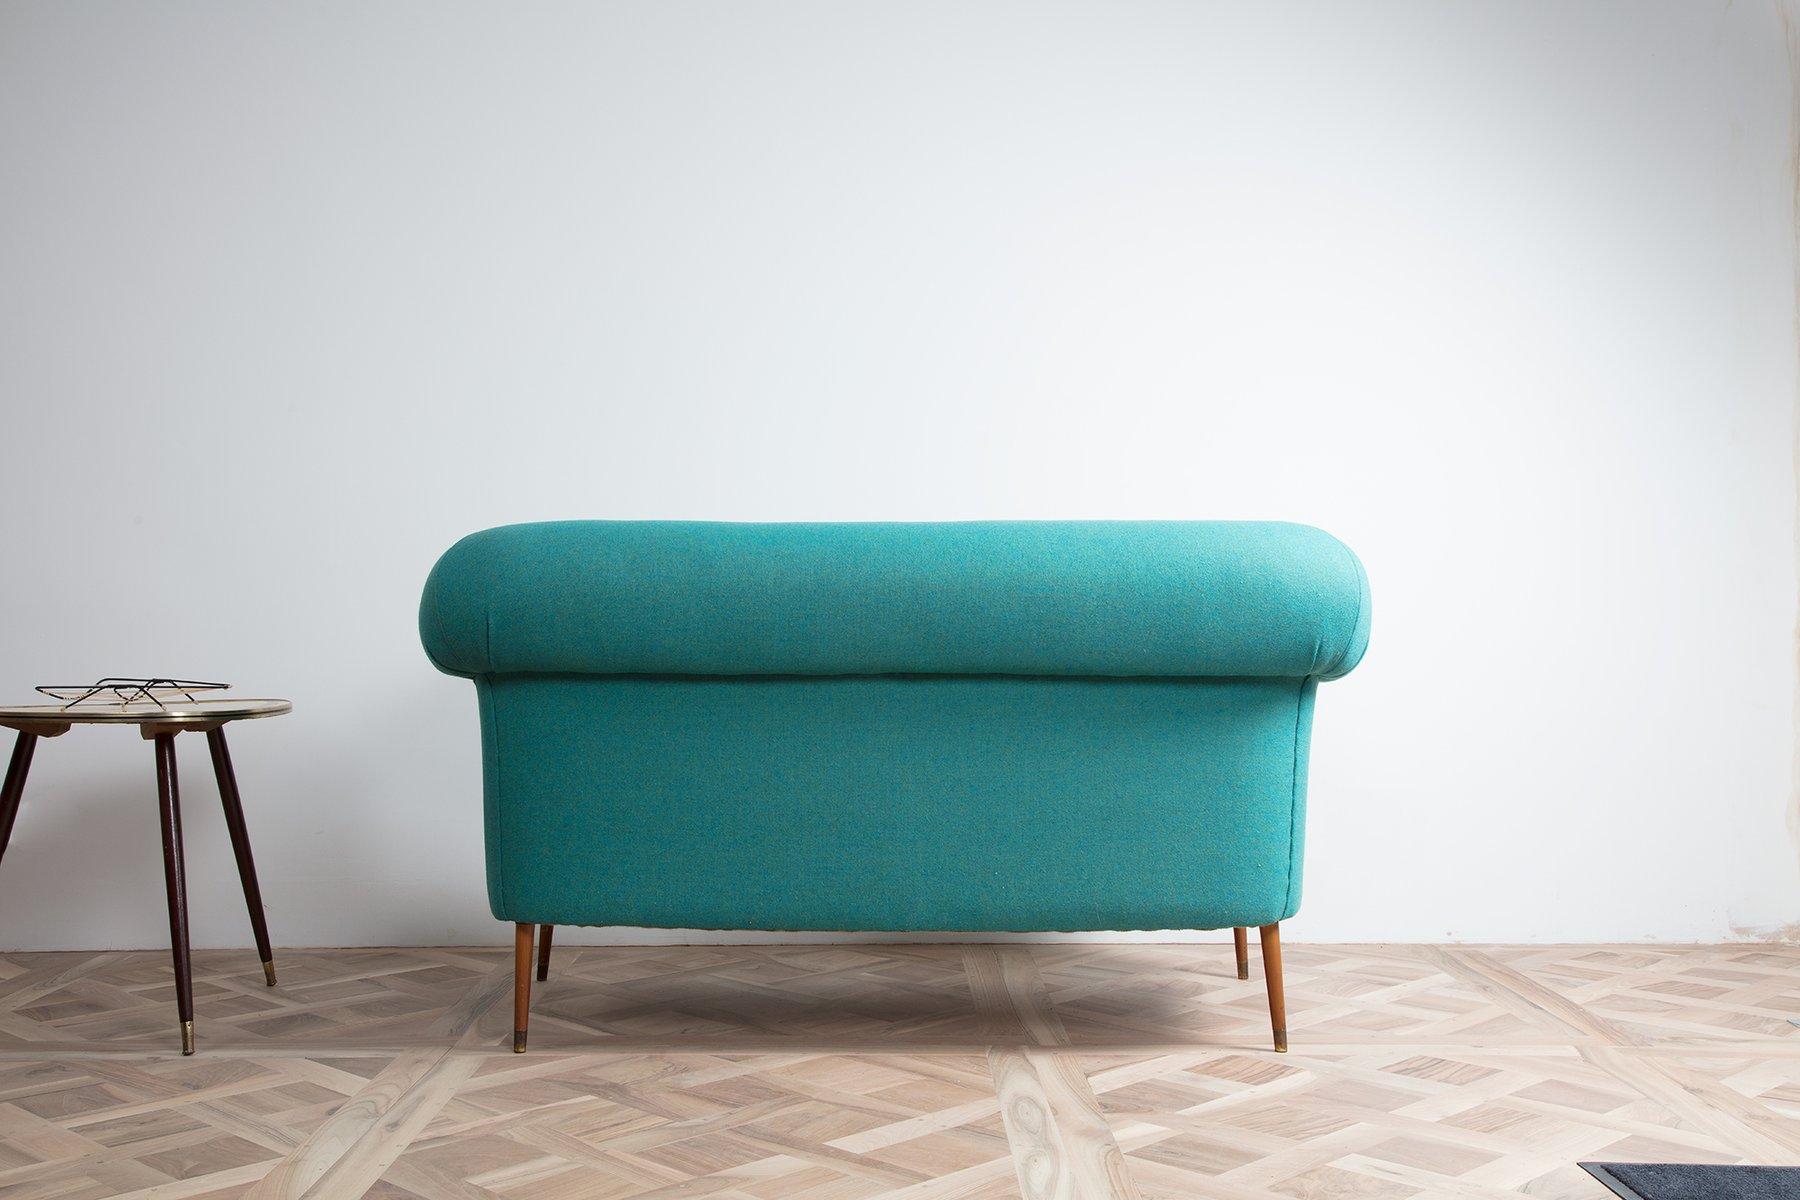 vintage sofa im chesterfield stil bei pamono kaufen. Black Bedroom Furniture Sets. Home Design Ideas